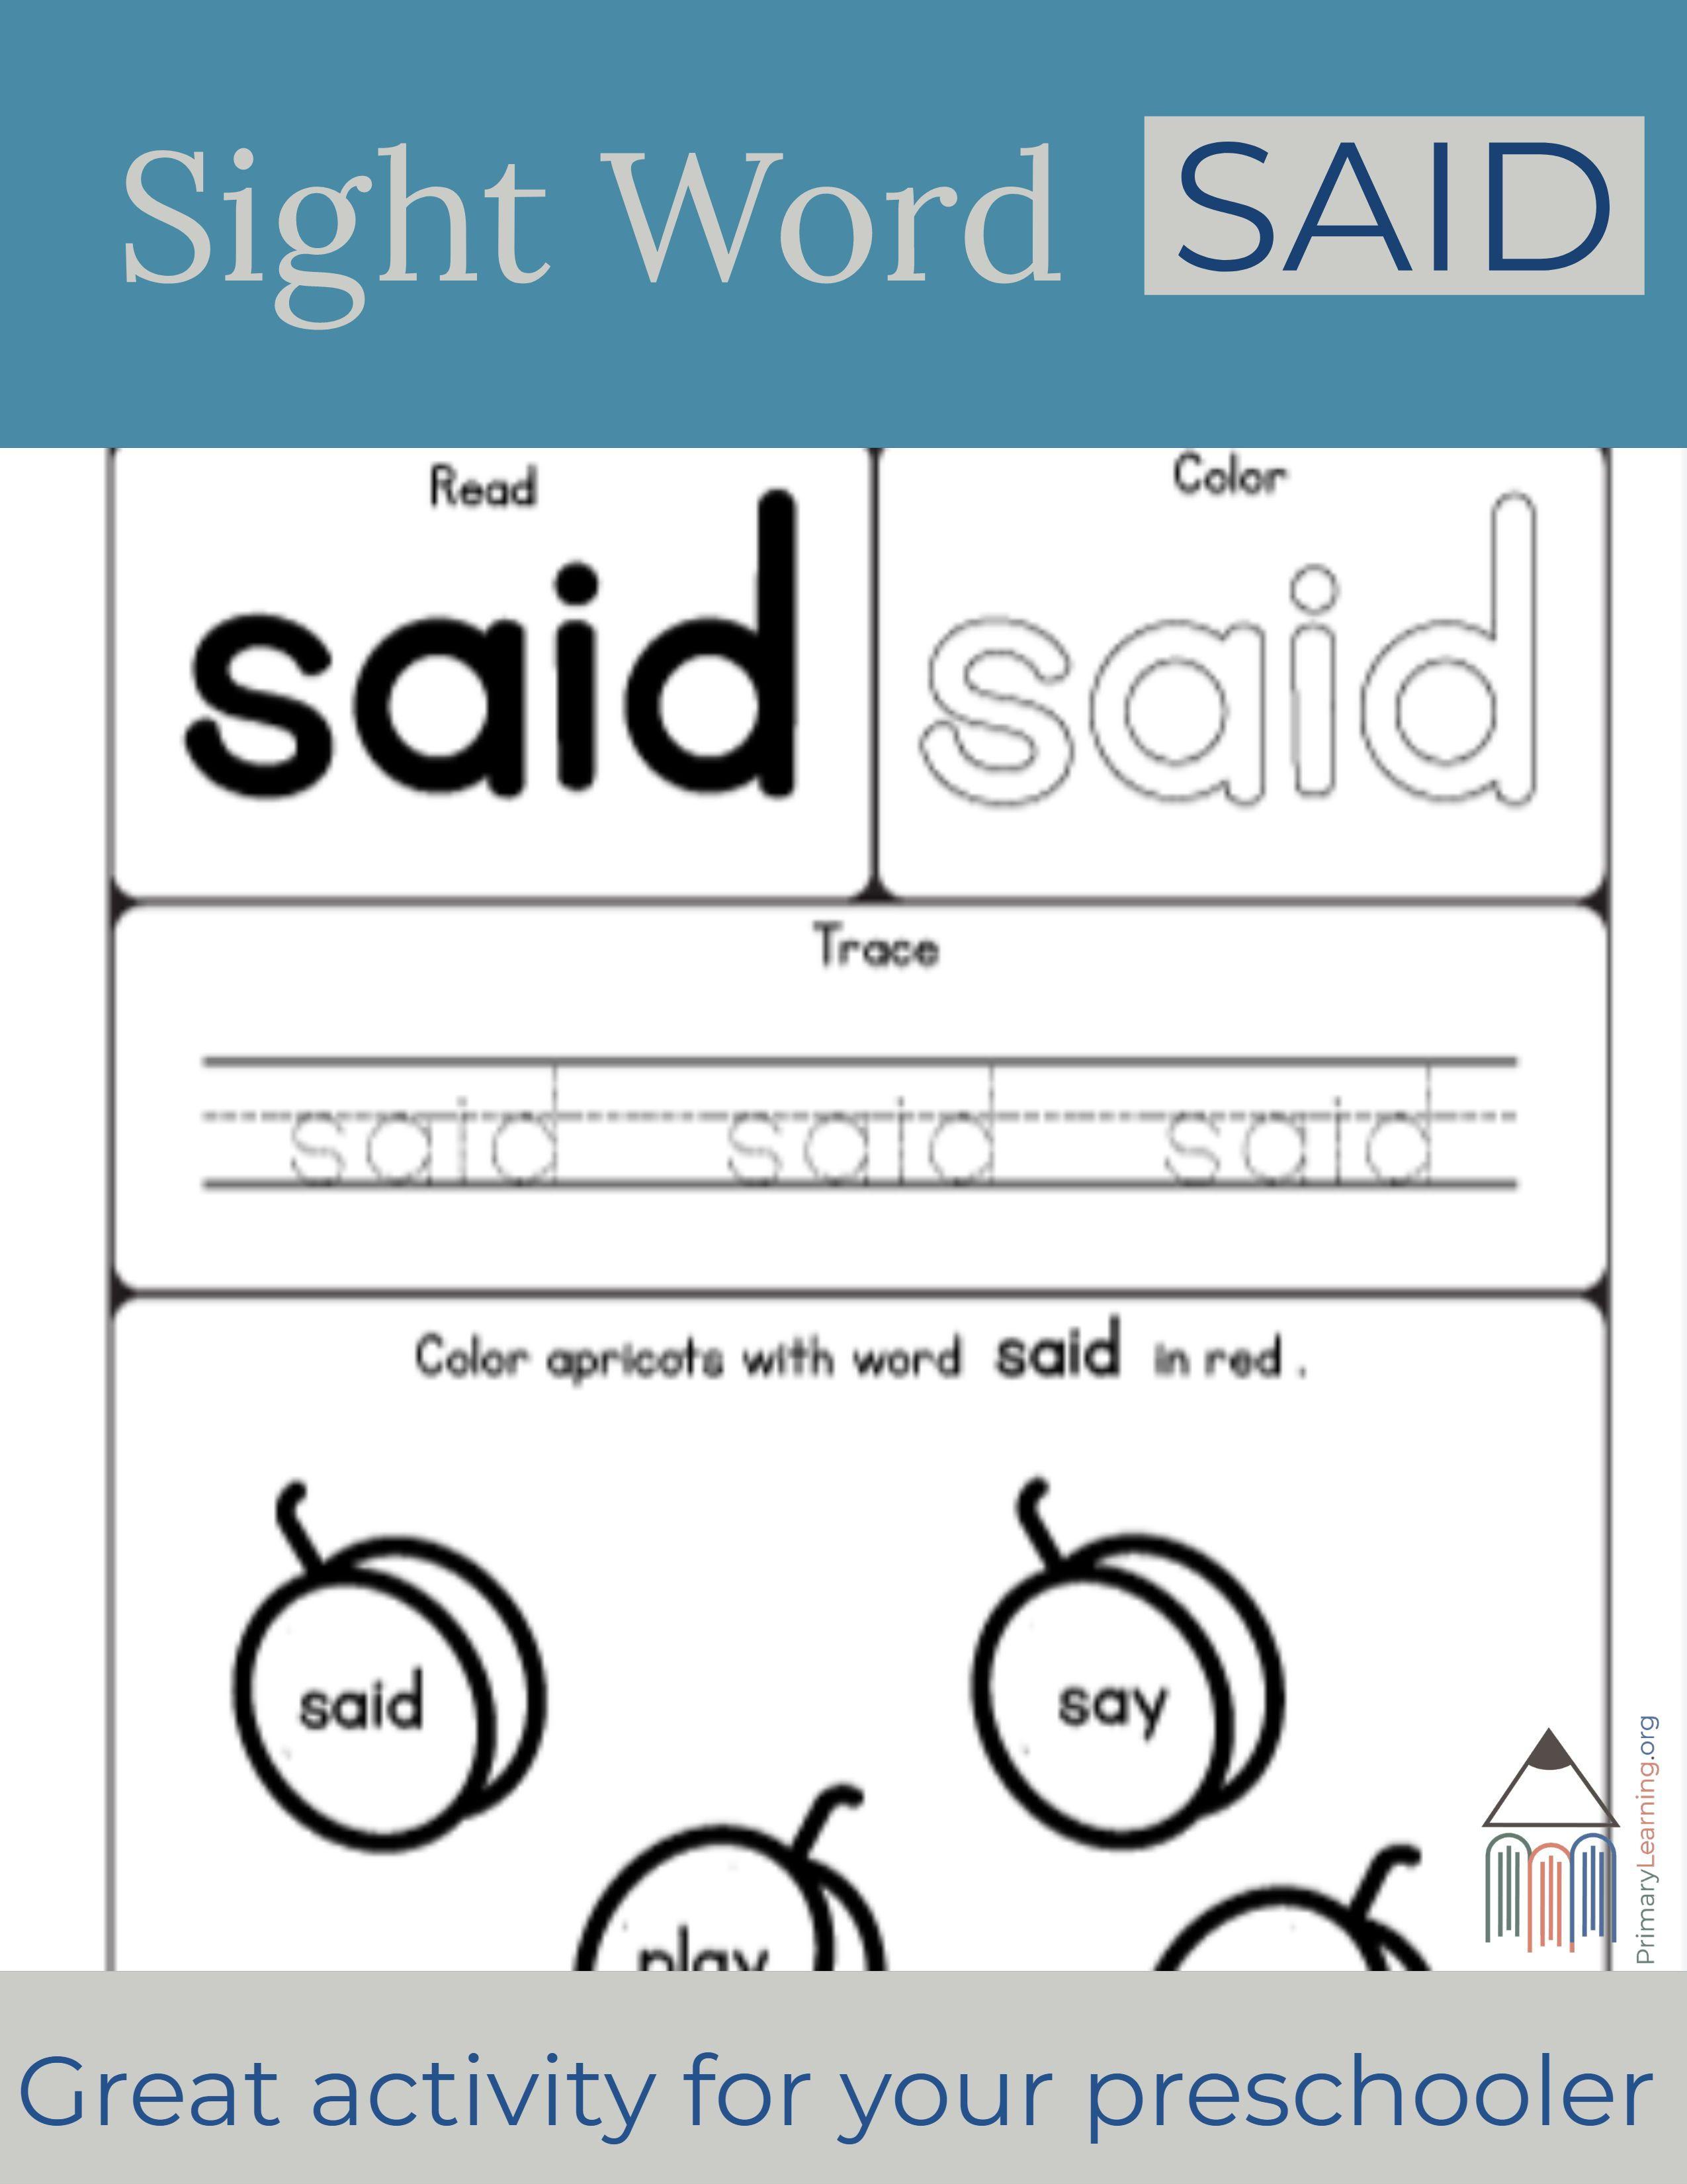 Sight Word Said Worksheet